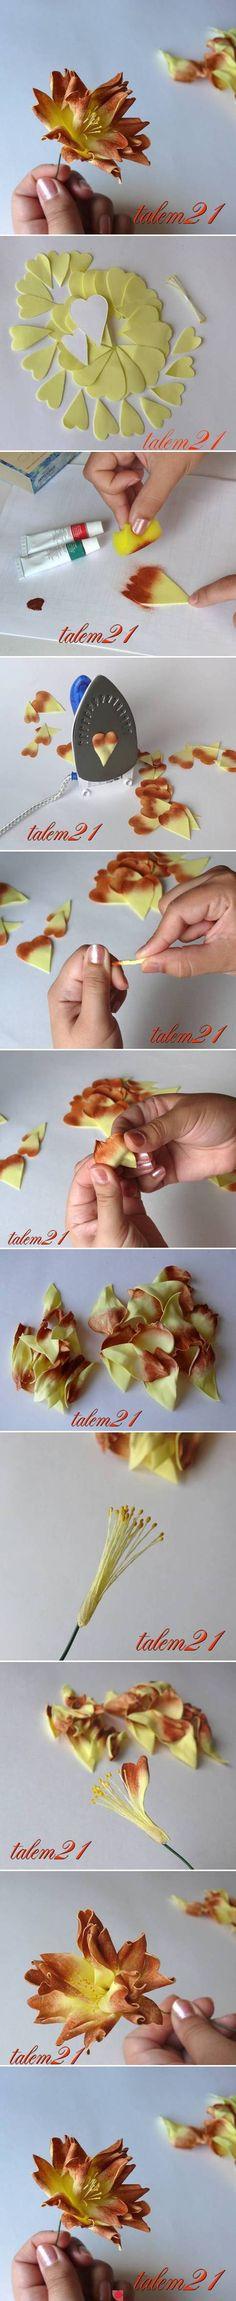 DIY Fantasy Flower DIY Fantasy Flower by diyforever Cloth Flowers, Paper Flowers Diy, Felt Flowers, Handmade Flowers, Flower Crafts, Fabric Flowers, Flower Diy, Heart Flower, Flower Step By Step